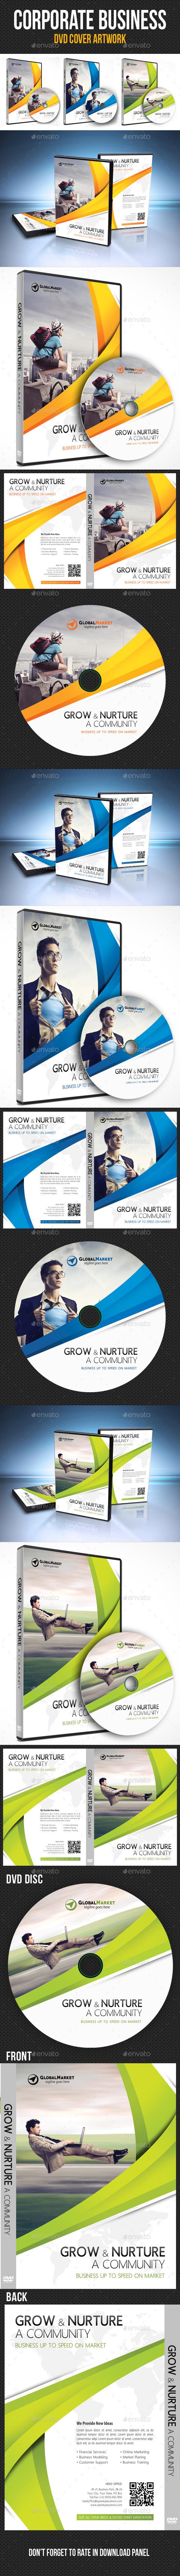 Corporate Business DVD Cover Template V01 - CD & DVD Artwork Print Templates